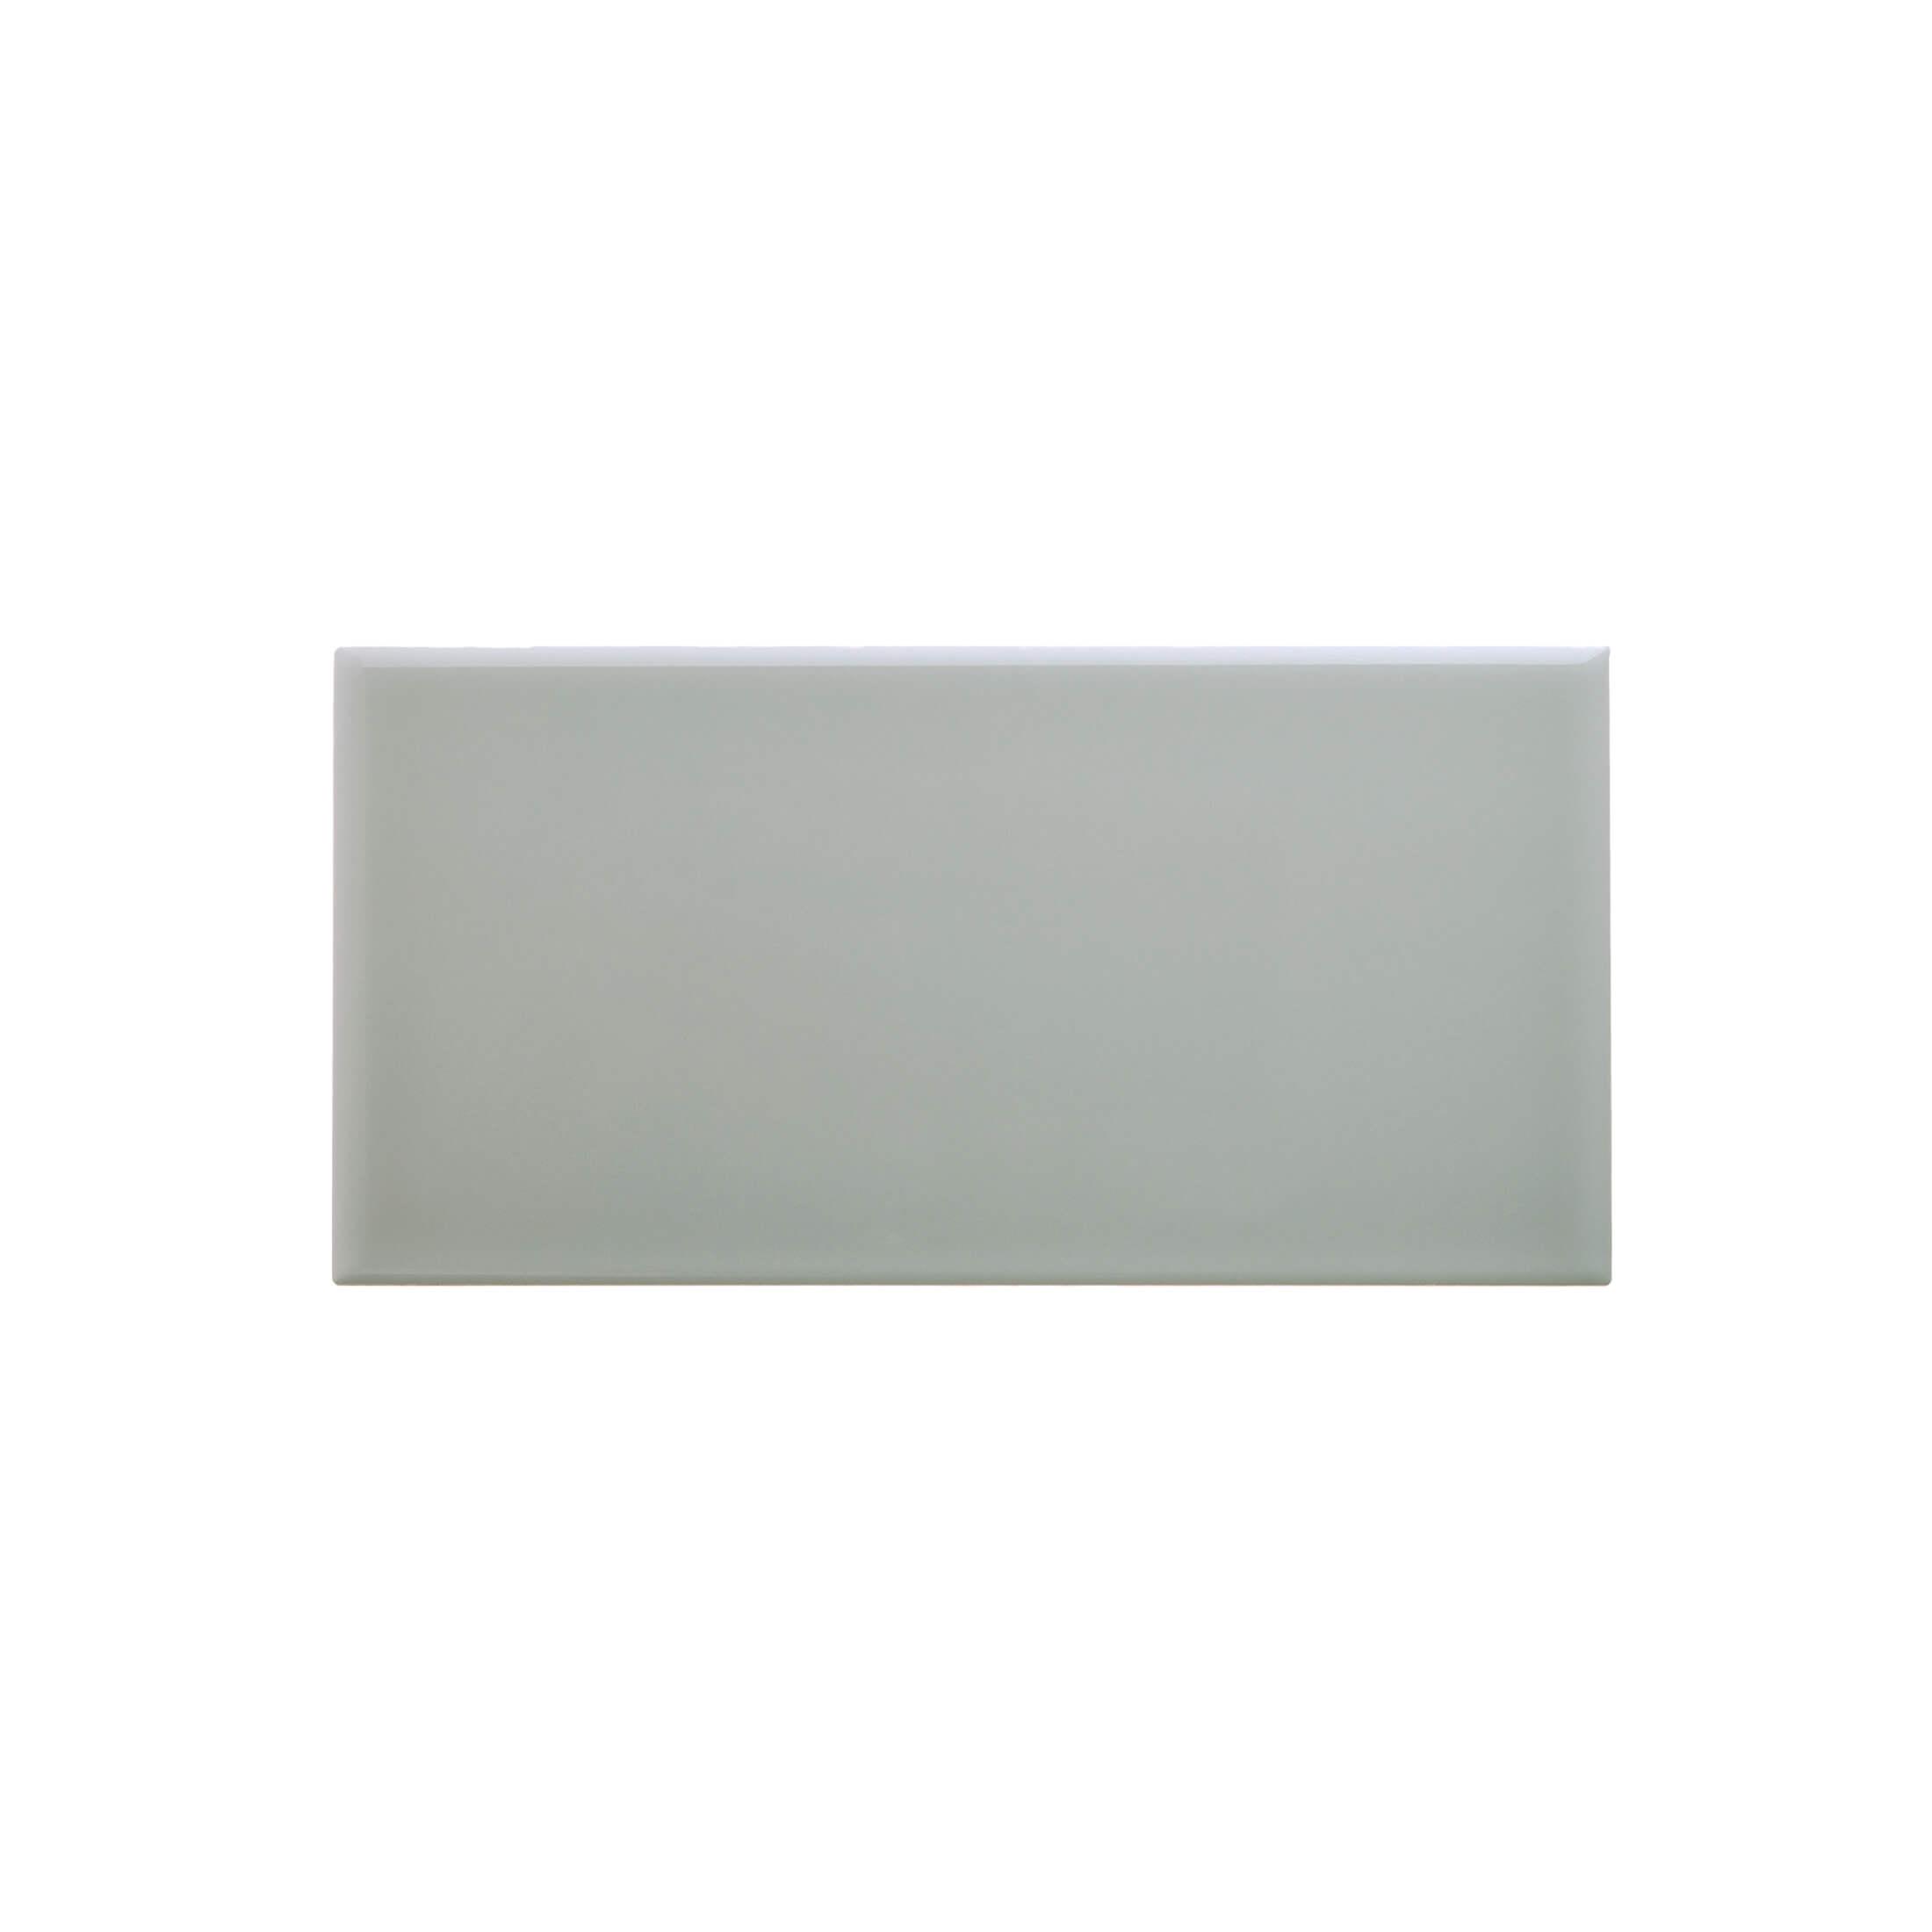 ADNE1094 - LISO PB - 10 cm X 20 cm